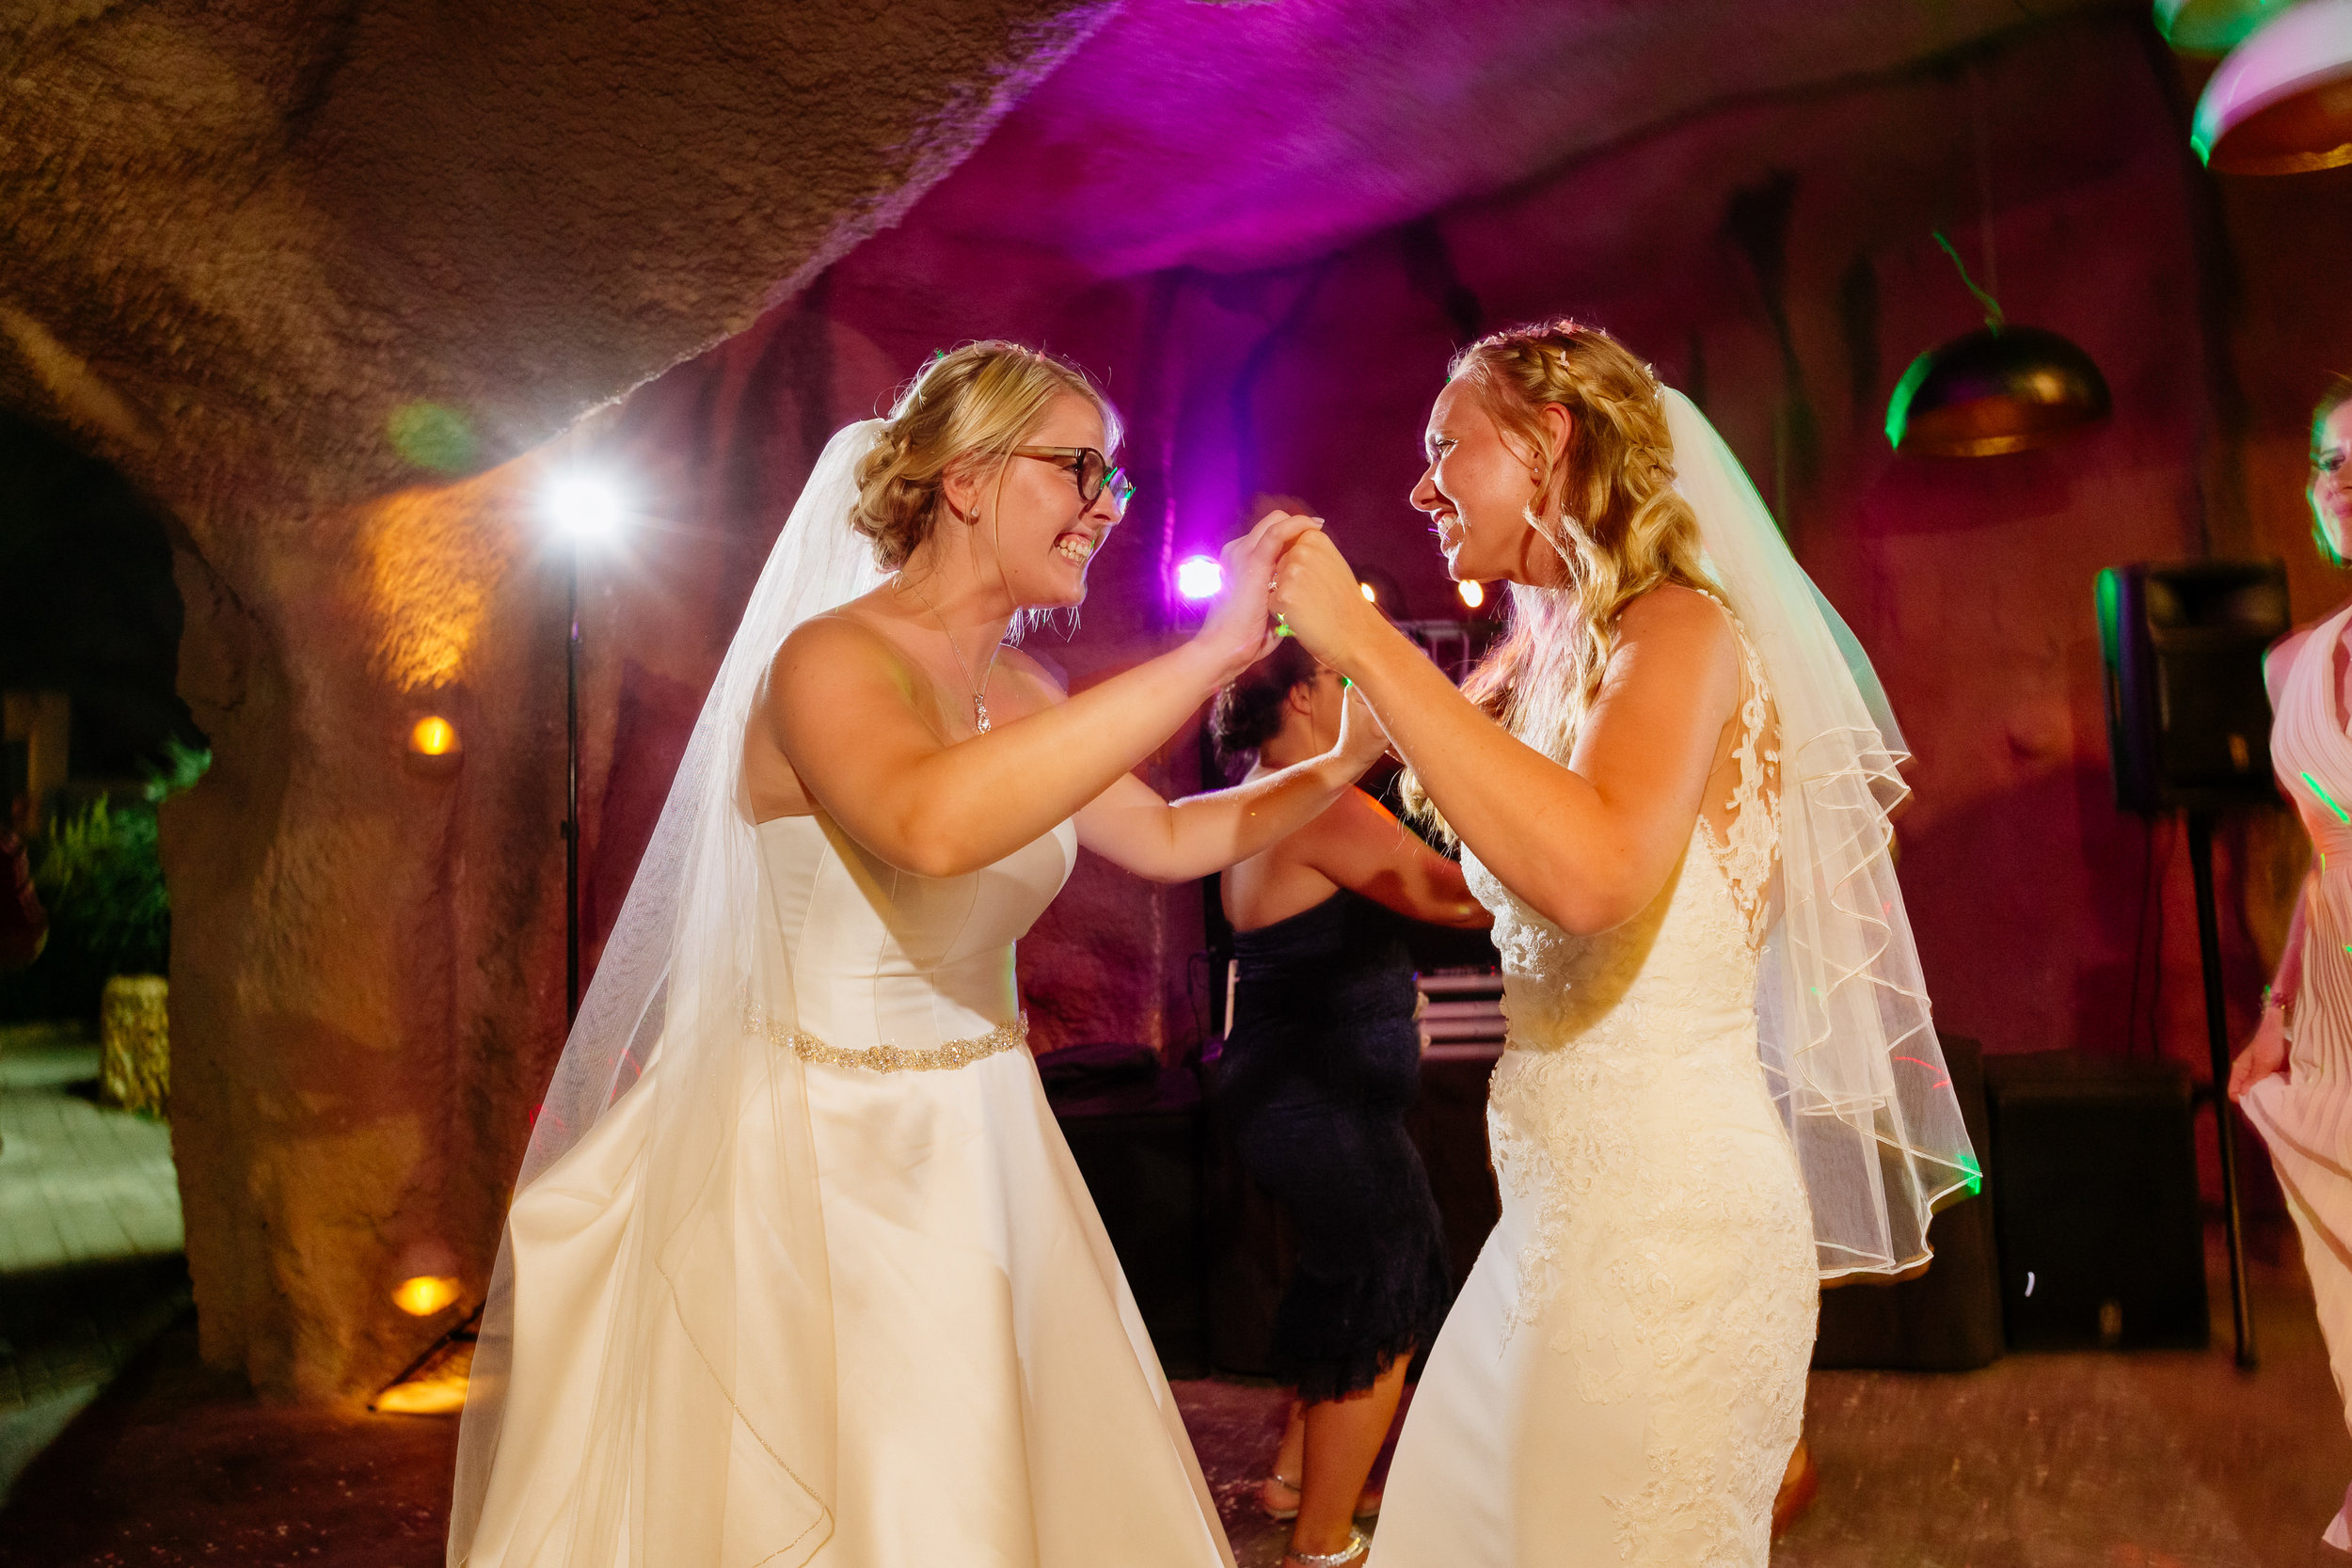 Malta_wedding_photography-110.jpg